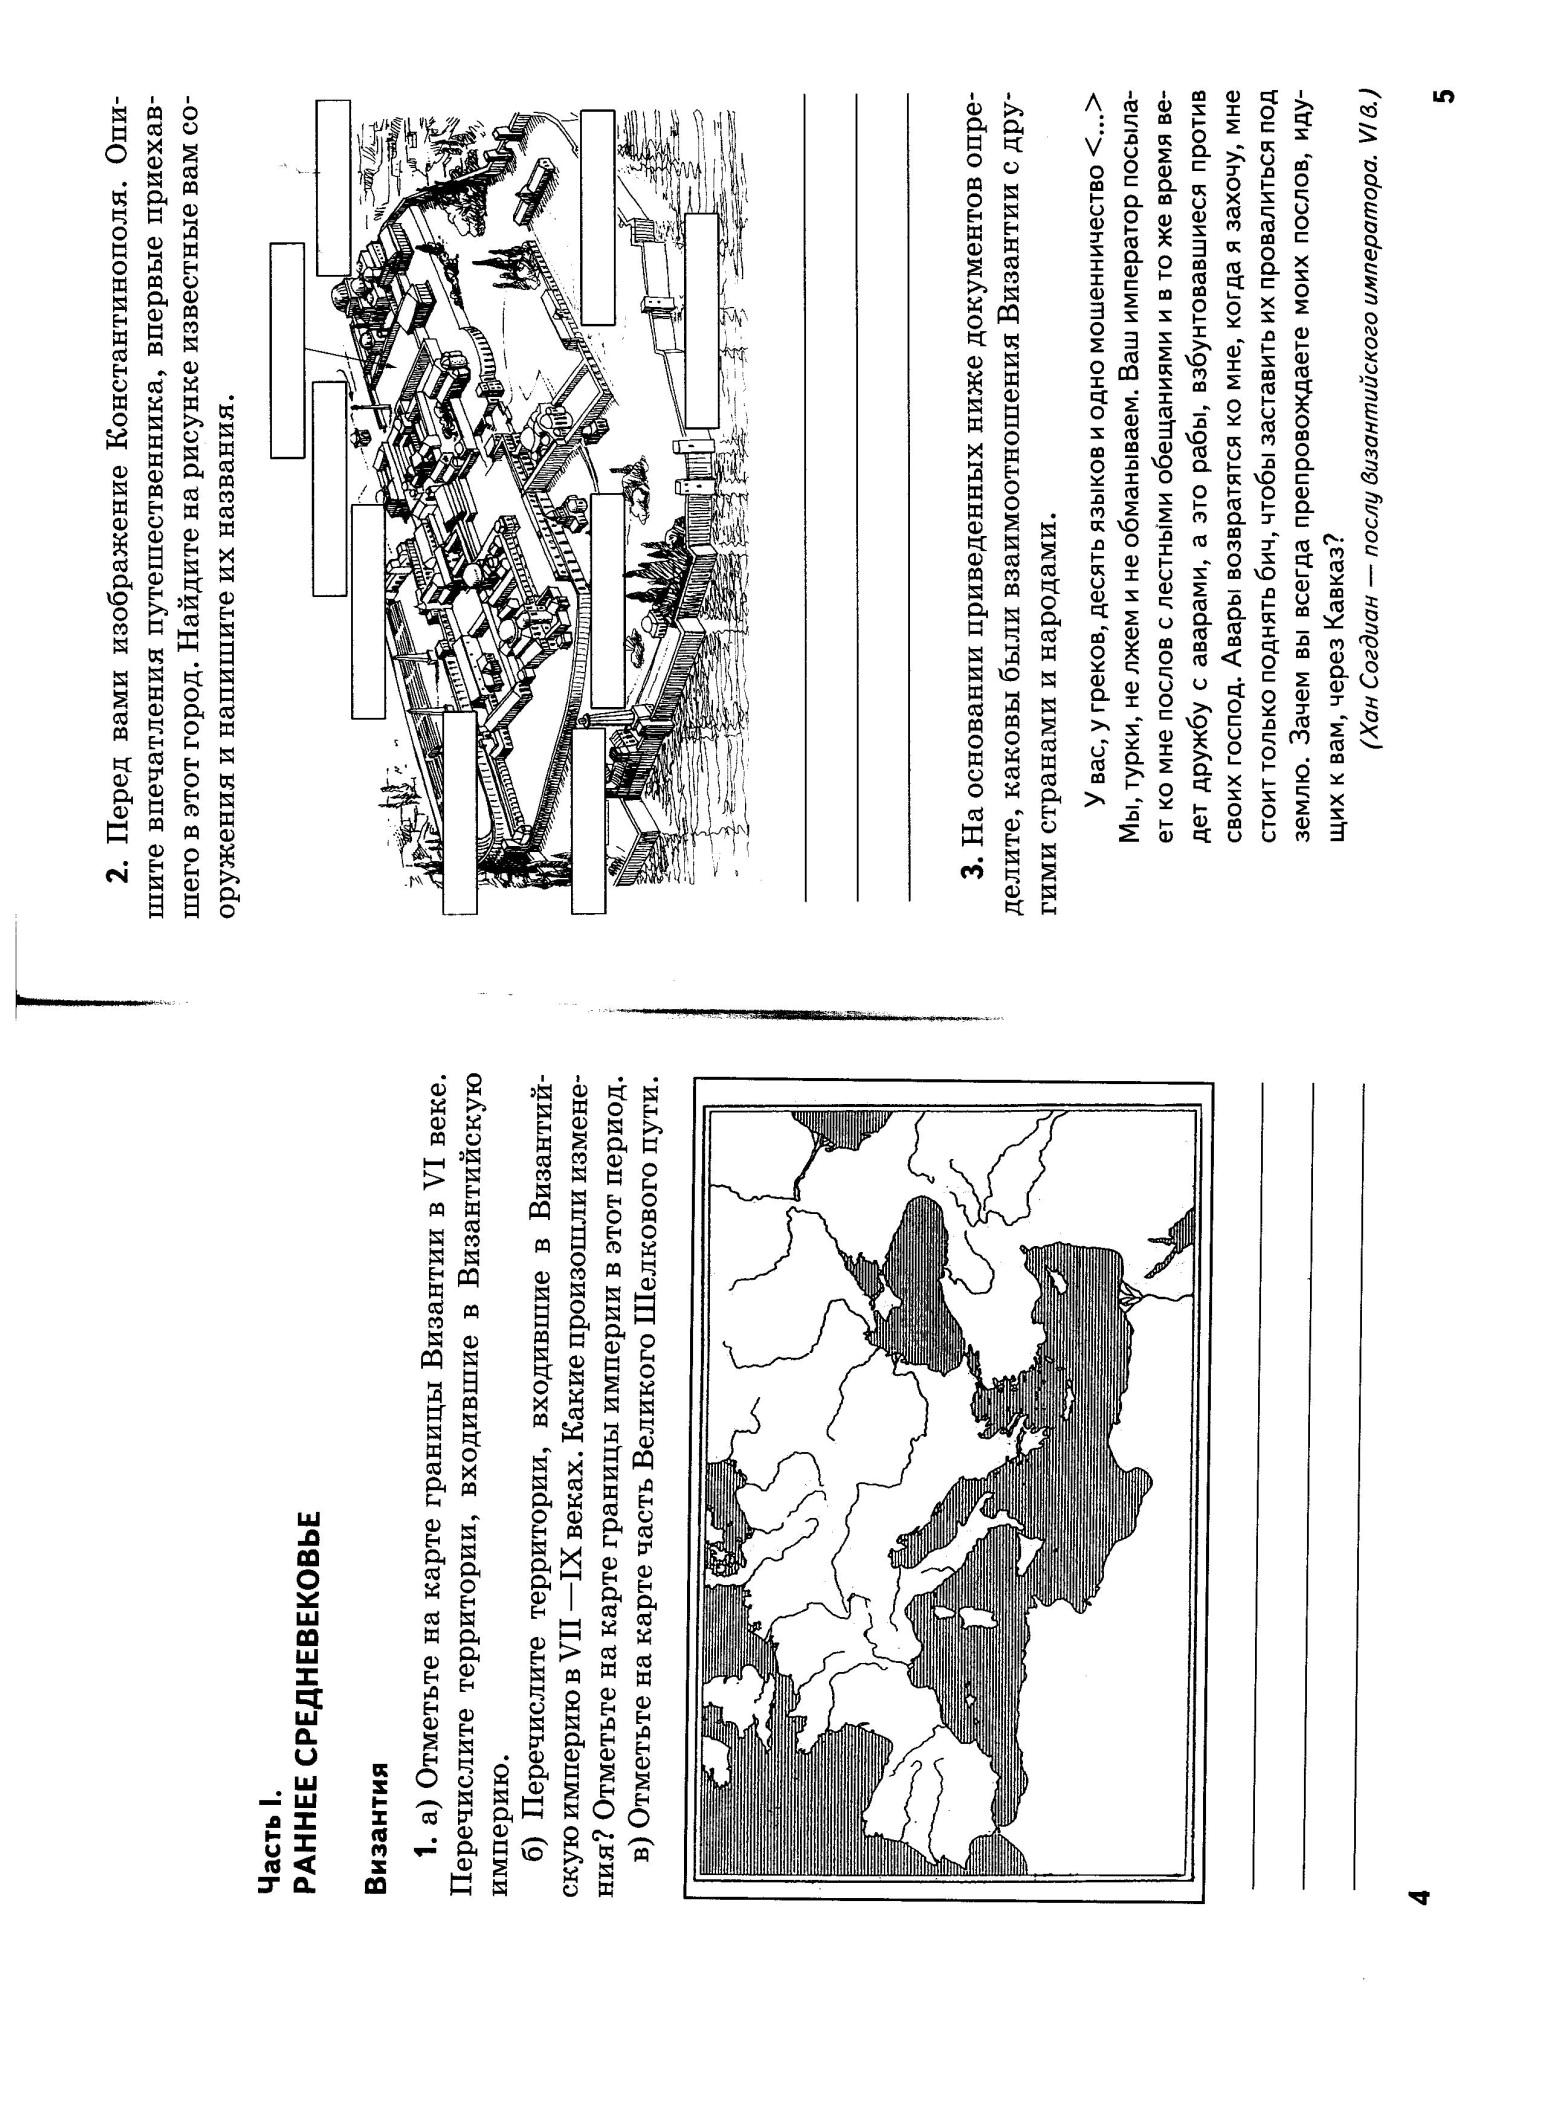 C:\Users\Дмитрий\Desktop\2013-09-07 Средние века\Средние века 001.jpg